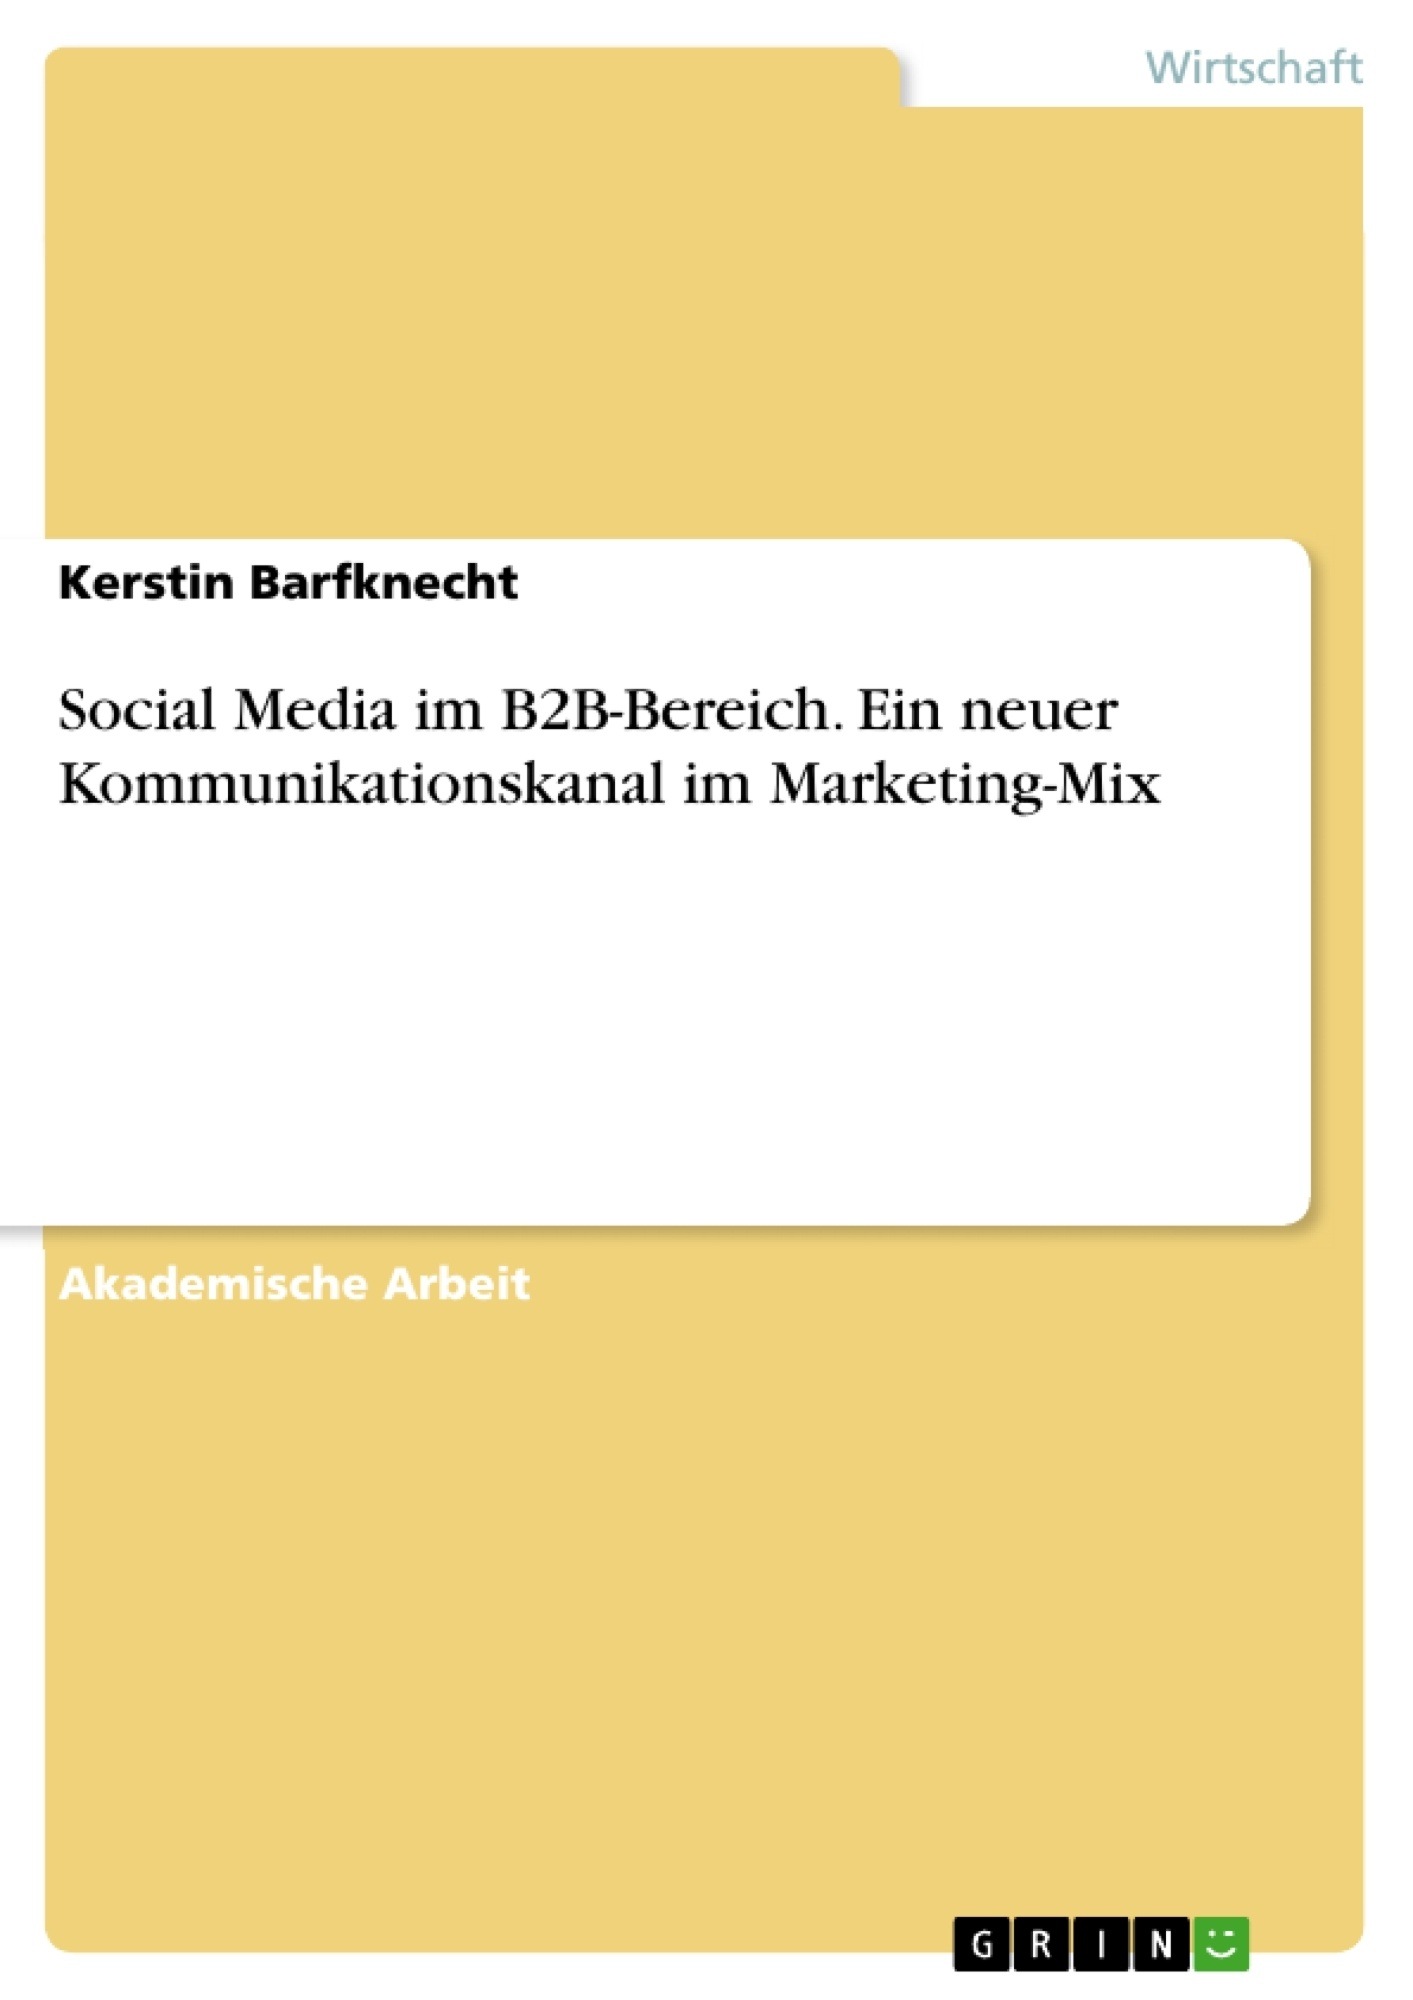 Titel: Social Media im B2B-Bereich. Ein neuer Kommunikationskanal im Marketing-Mix